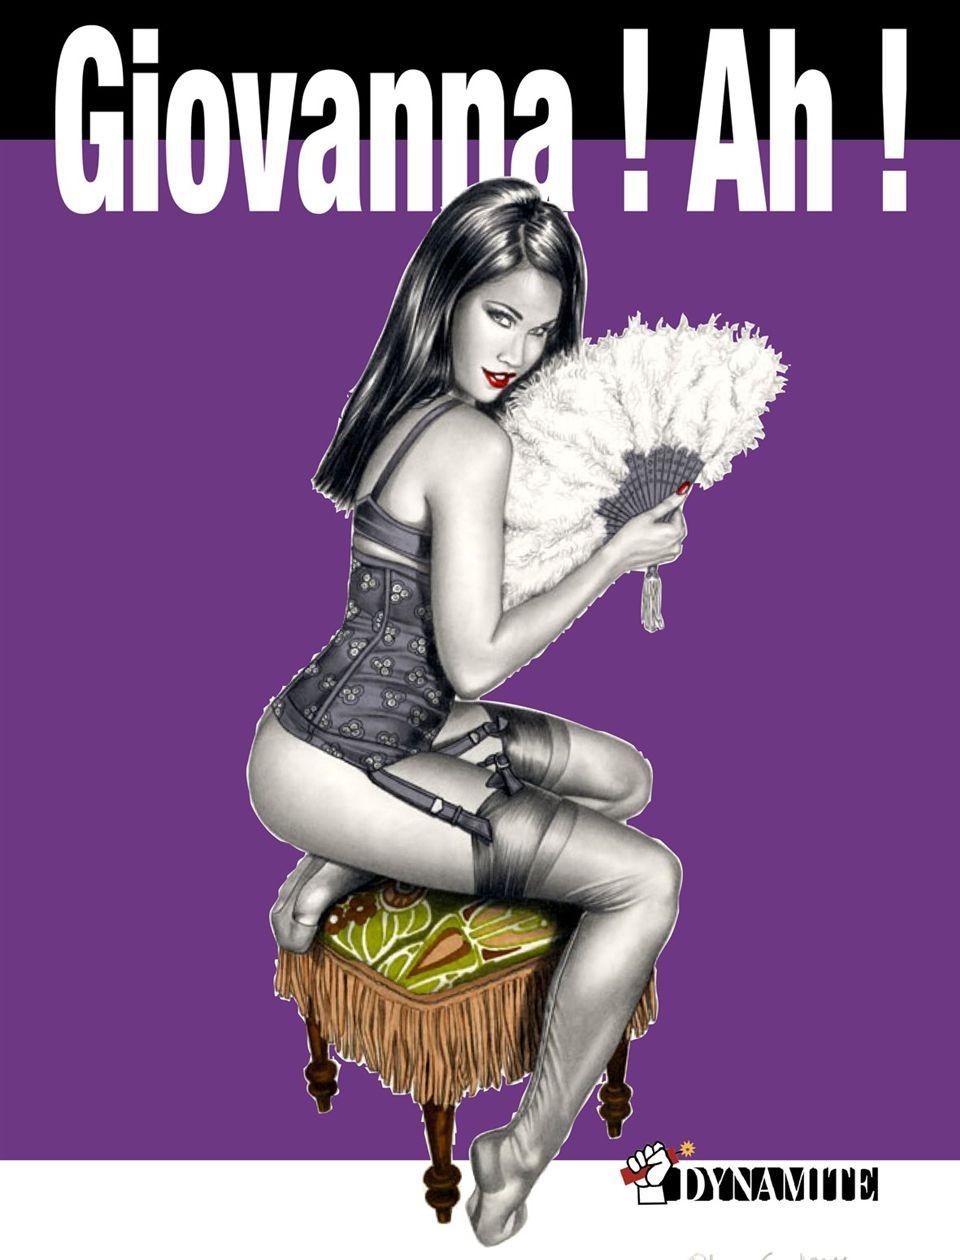 Giovanna ! Ah ! - Giovanna Casotto